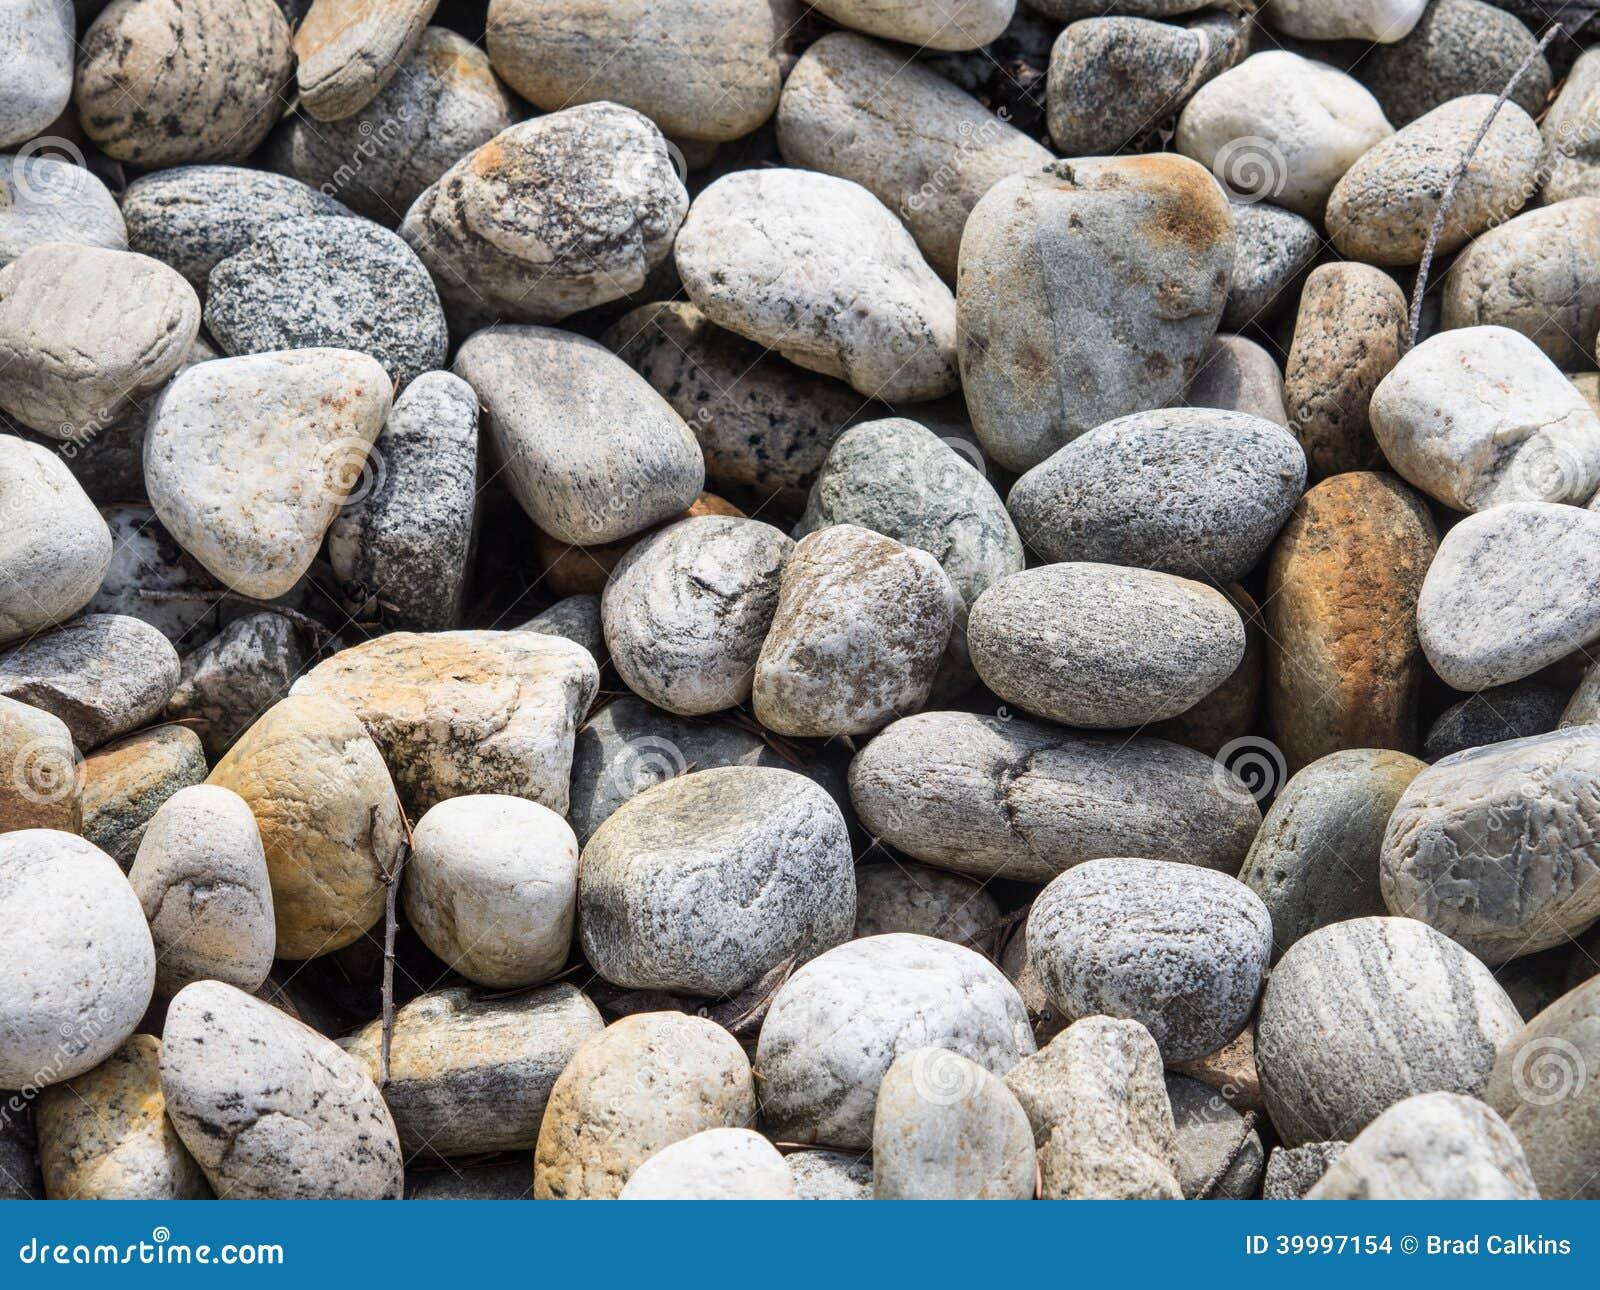 Garden Design Garden Design with Landscape Rocks Stock Photo